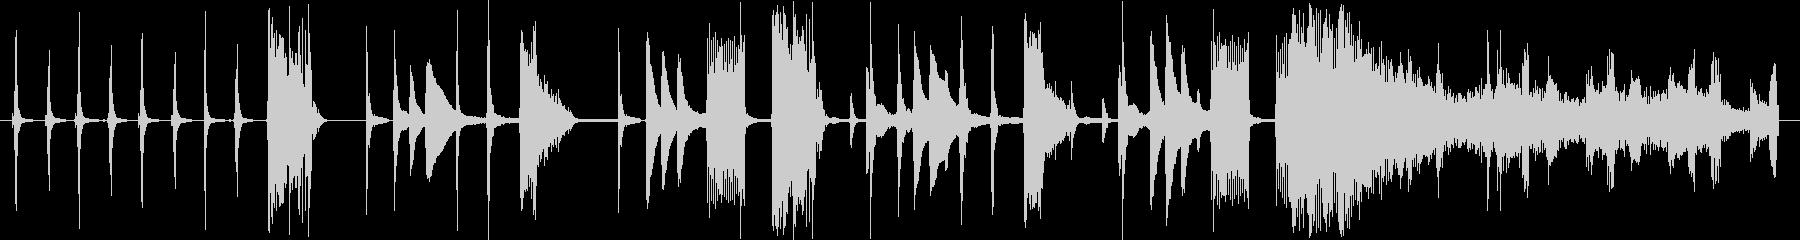 BGM for CM using various clock sounds's unreproduced waveform